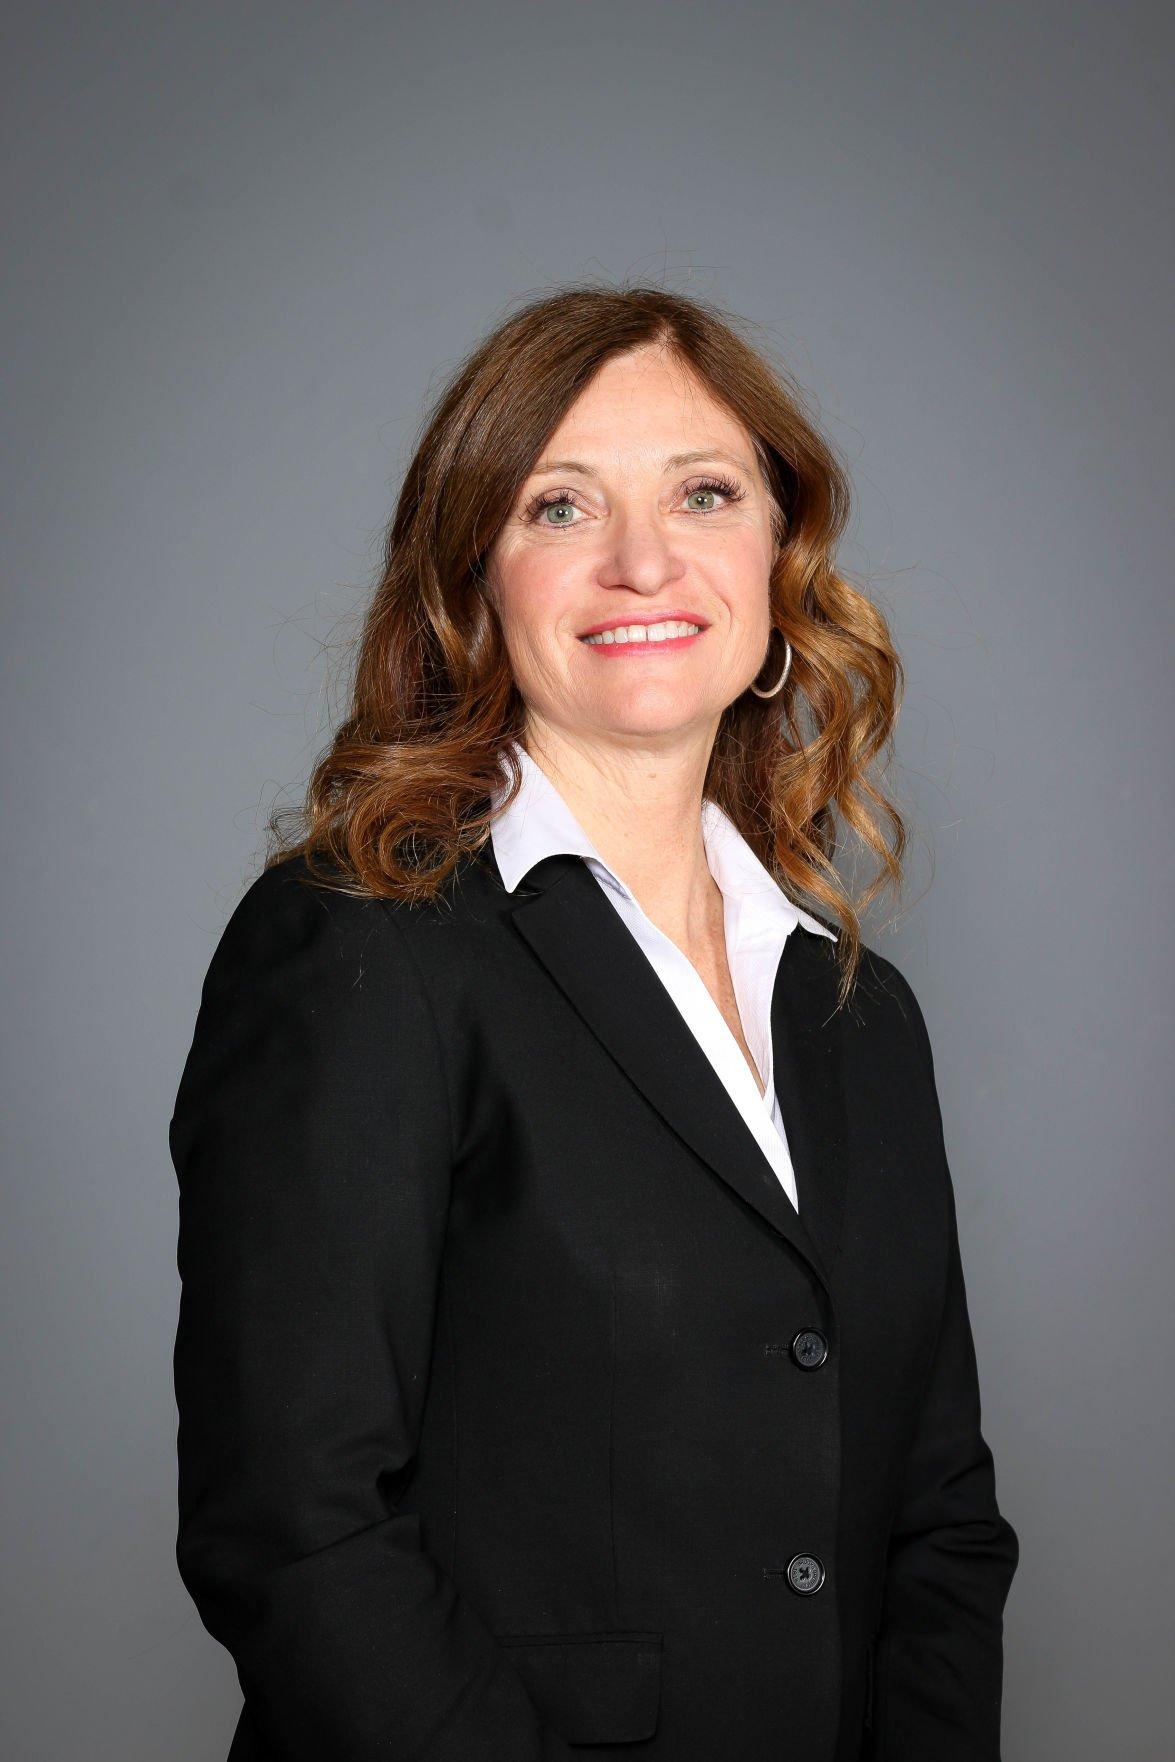 Cynthia Zimmer